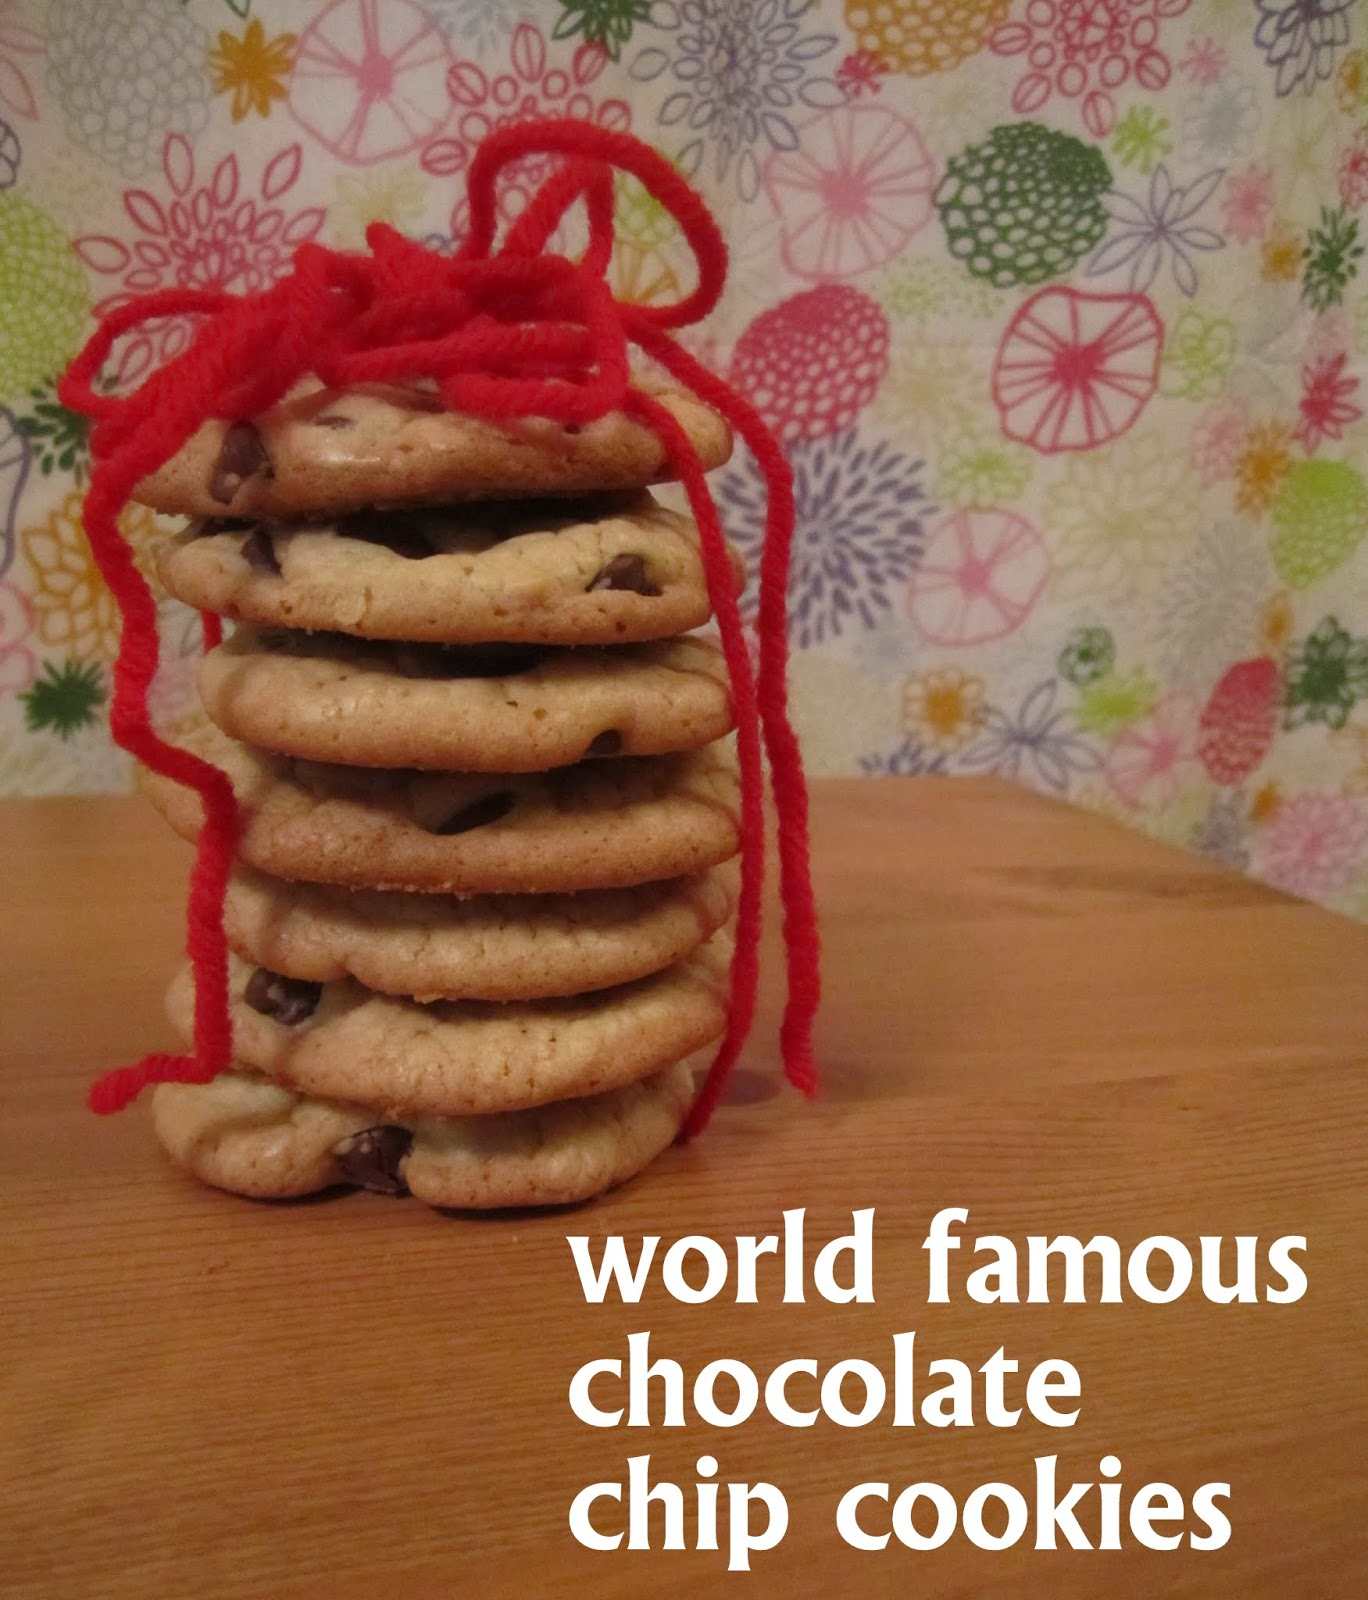 World Famous Chocolate Chip Cookies - Pumpkin Chocolate Chip Cookies